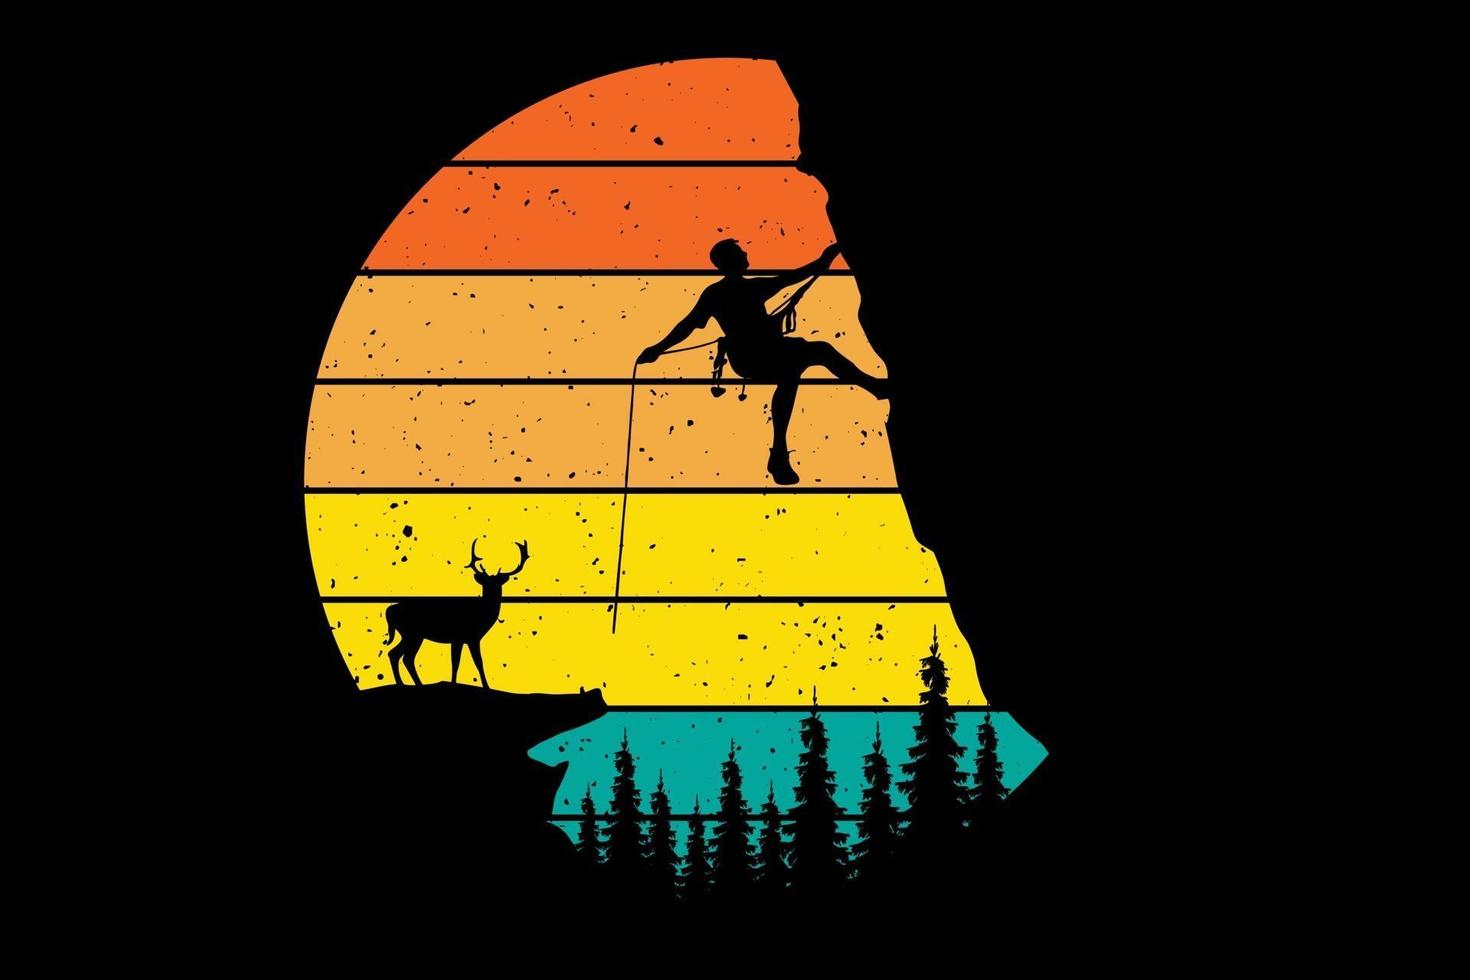 T-shirt hiking deer mountain pine style illustration vector